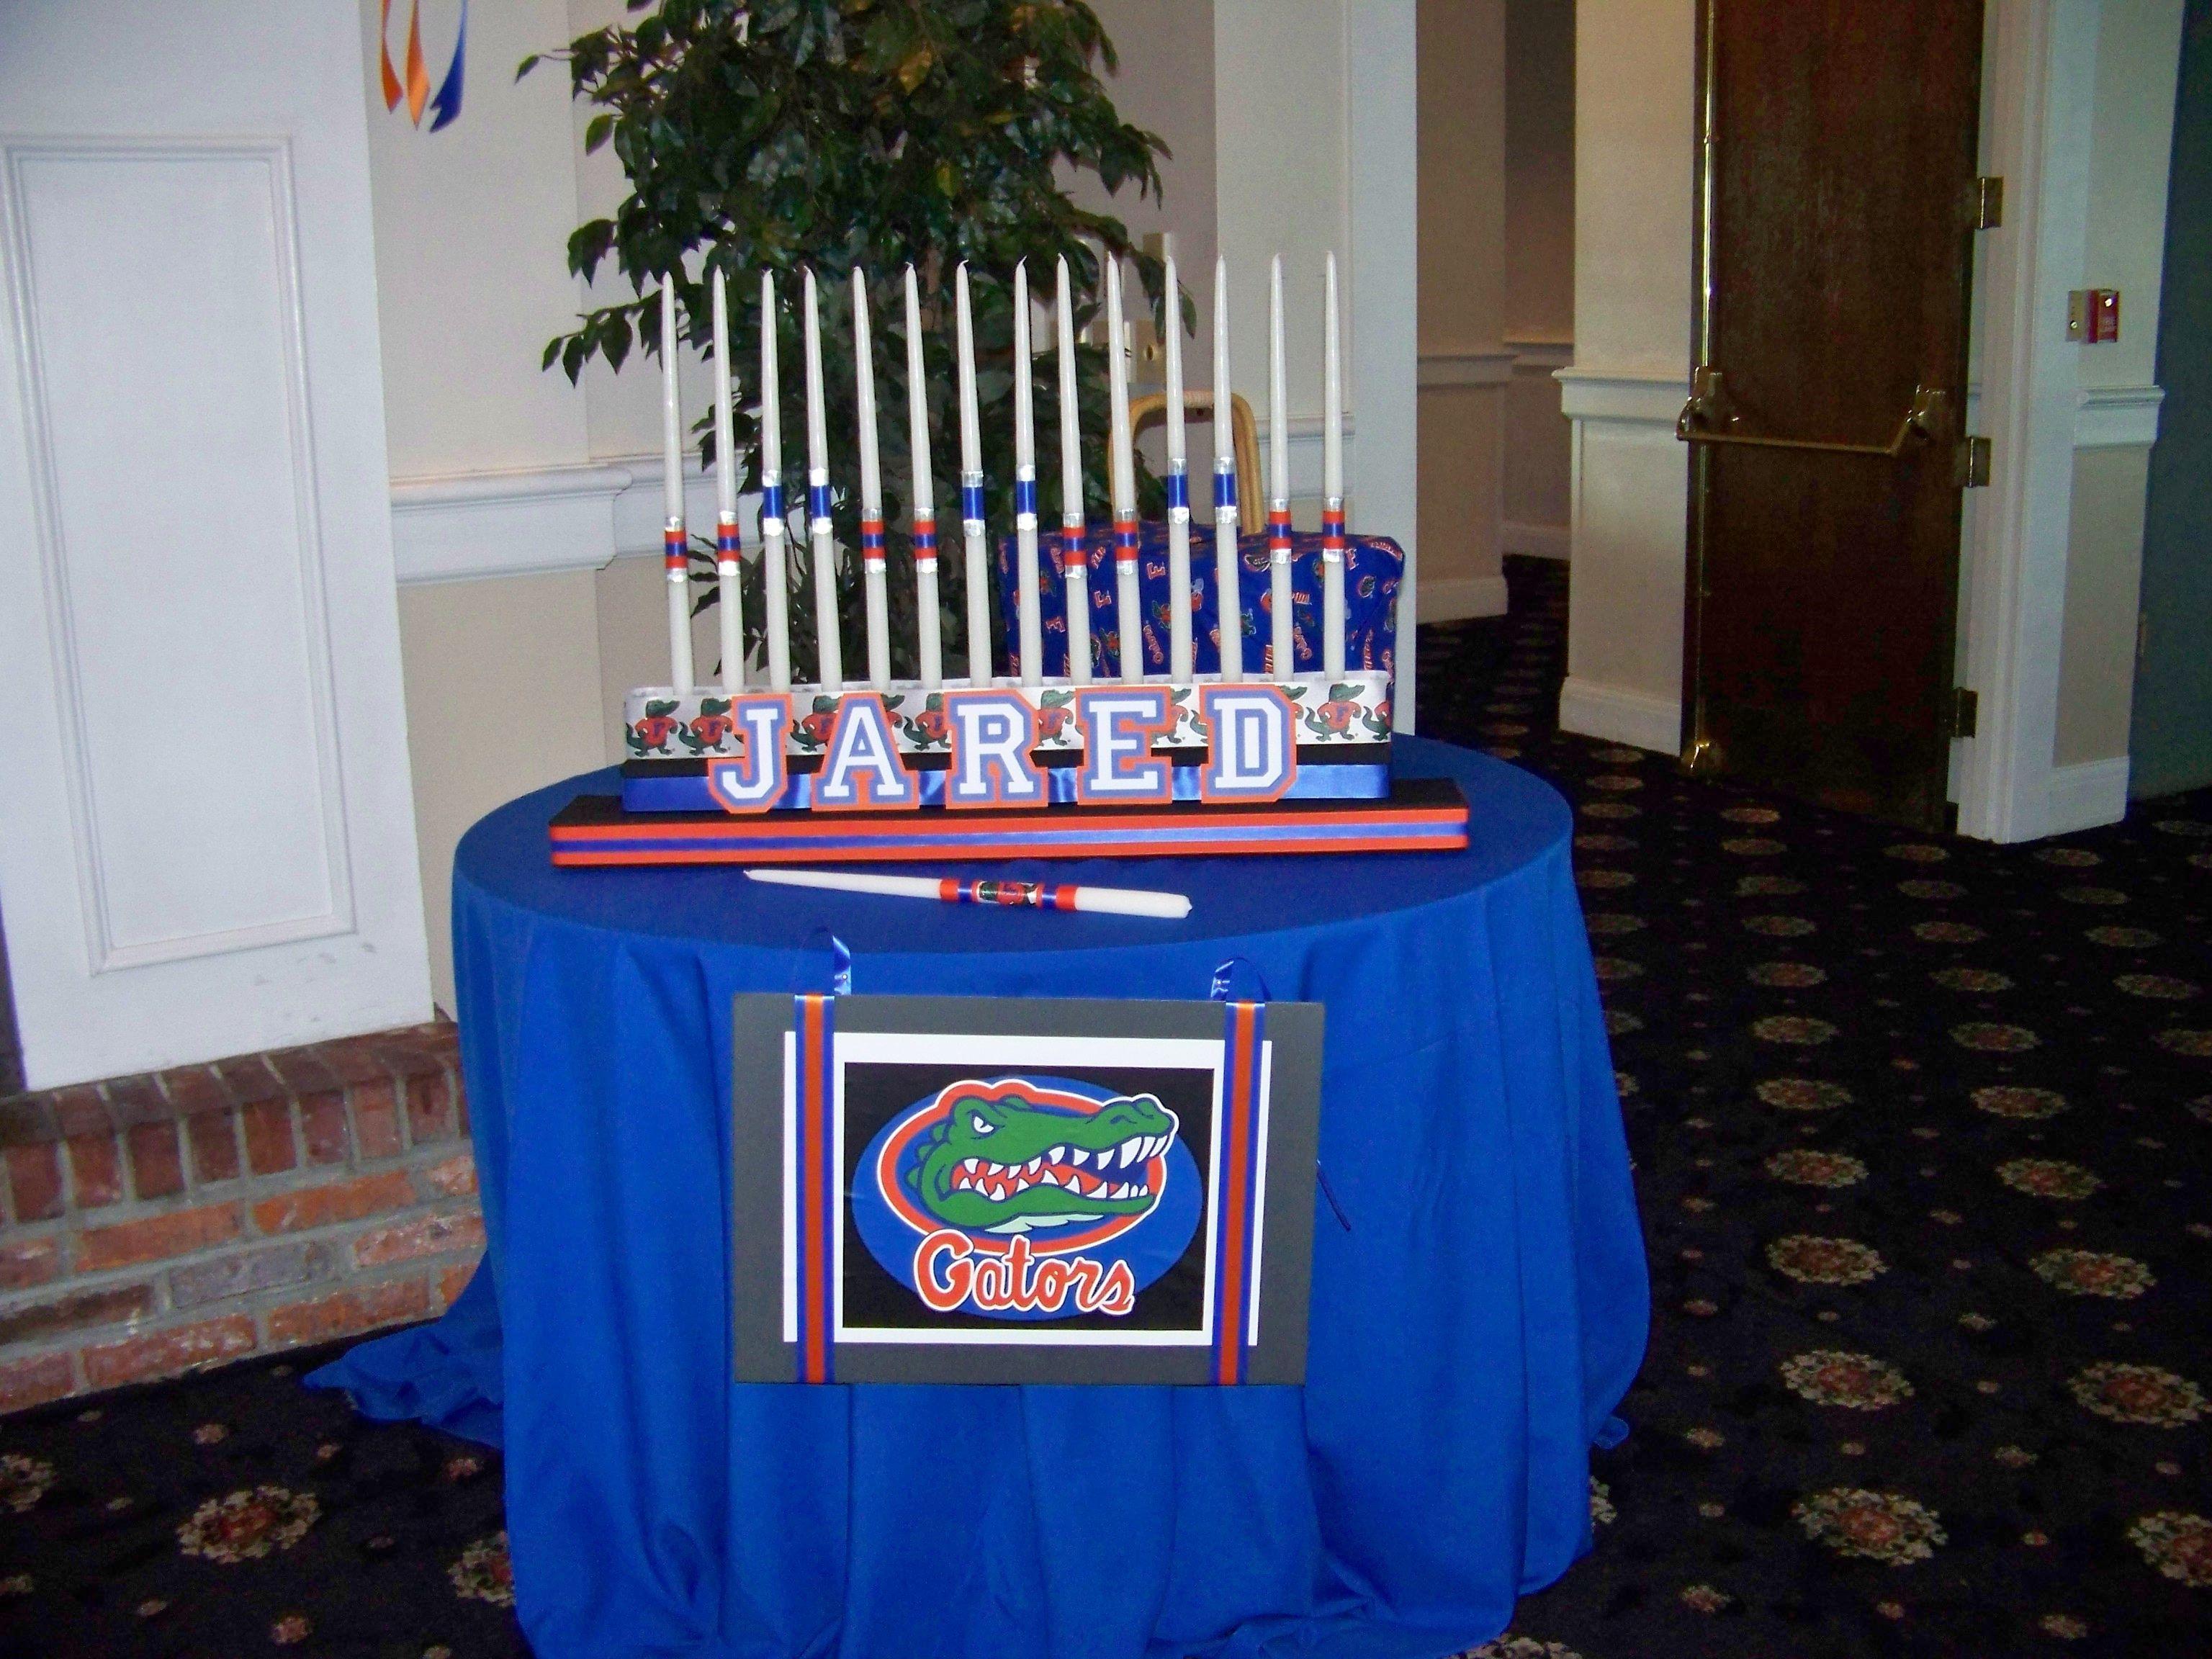 Florida Gator Candle Lighting Sports Theme Bar Mitzvah By Omas